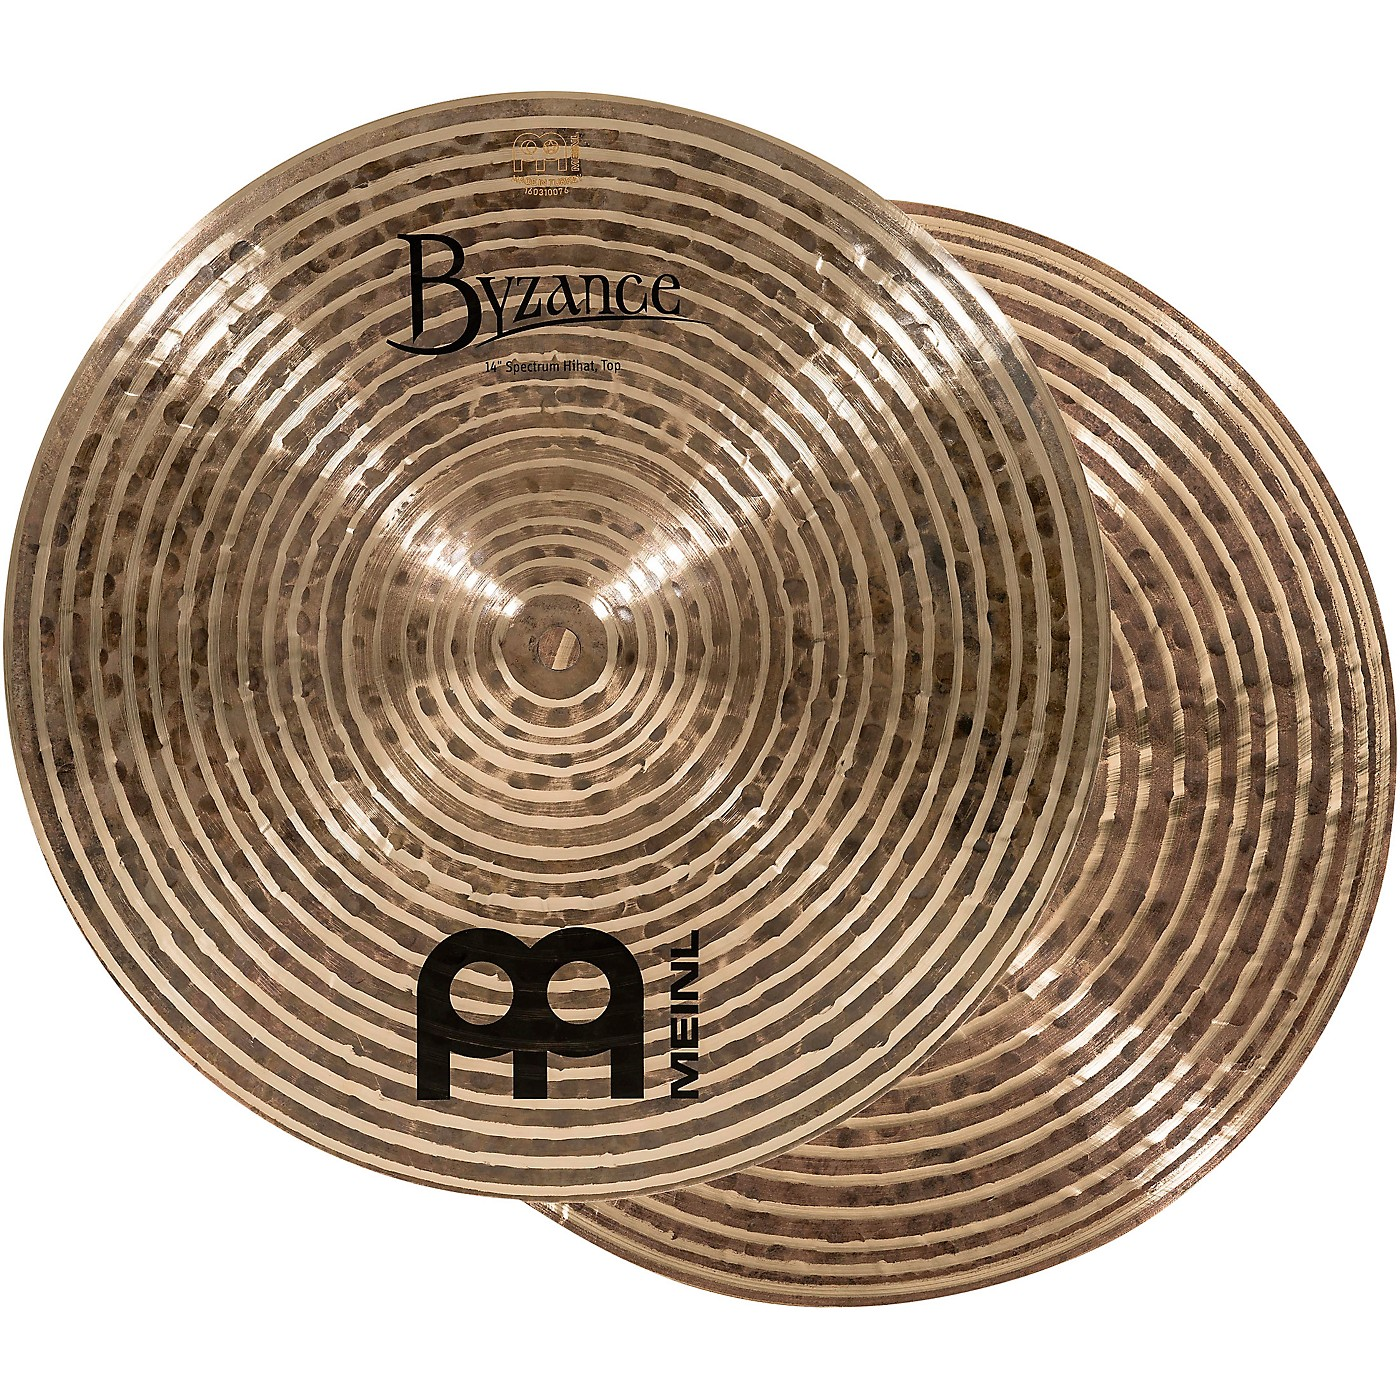 Meinl Byzance Dark Spectrum Hi-hat Cymbals thumbnail